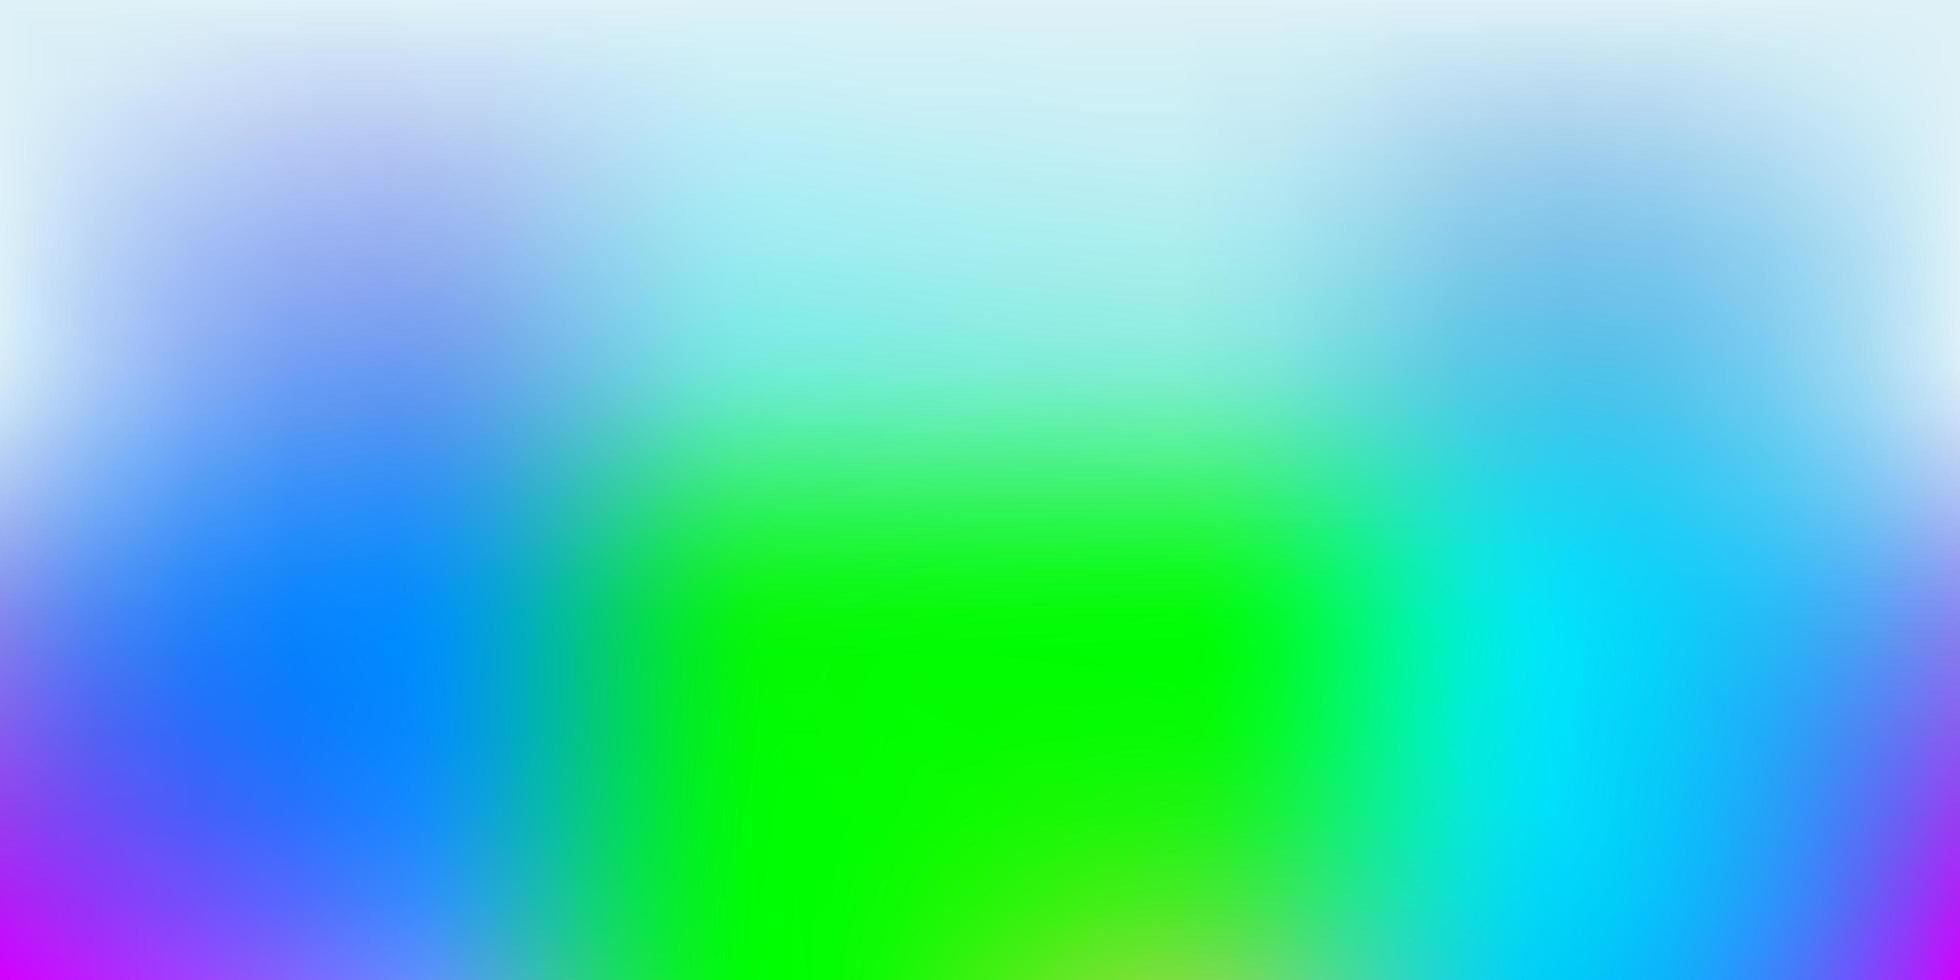 luz multicolor vetor turva pano de fundo.